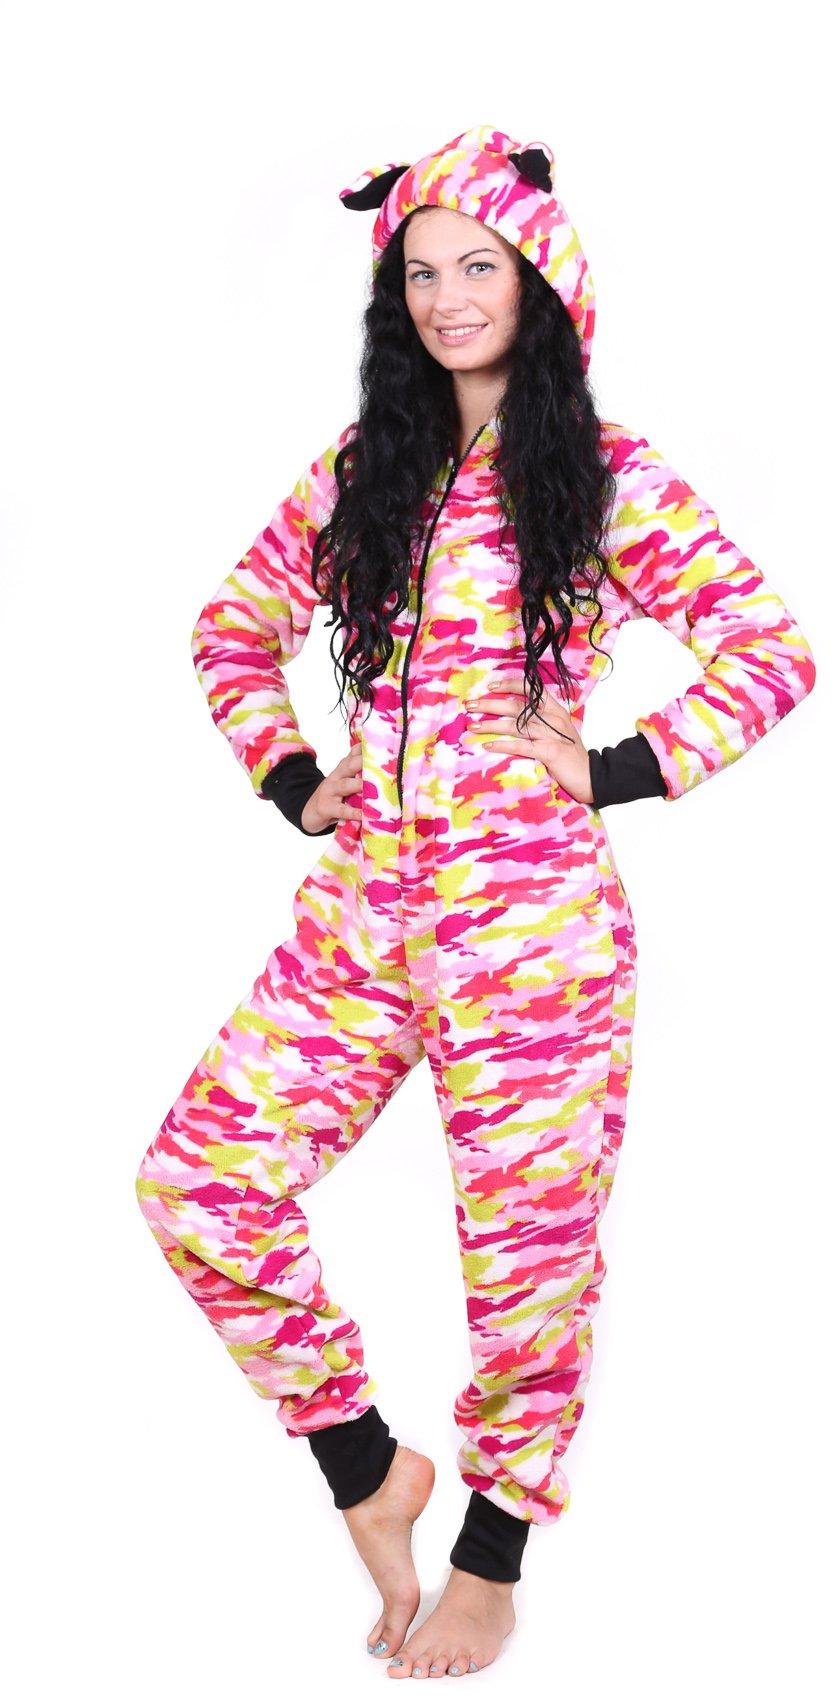 Totally Pink Women's Warm and Cozy Plush Onesie Pajama